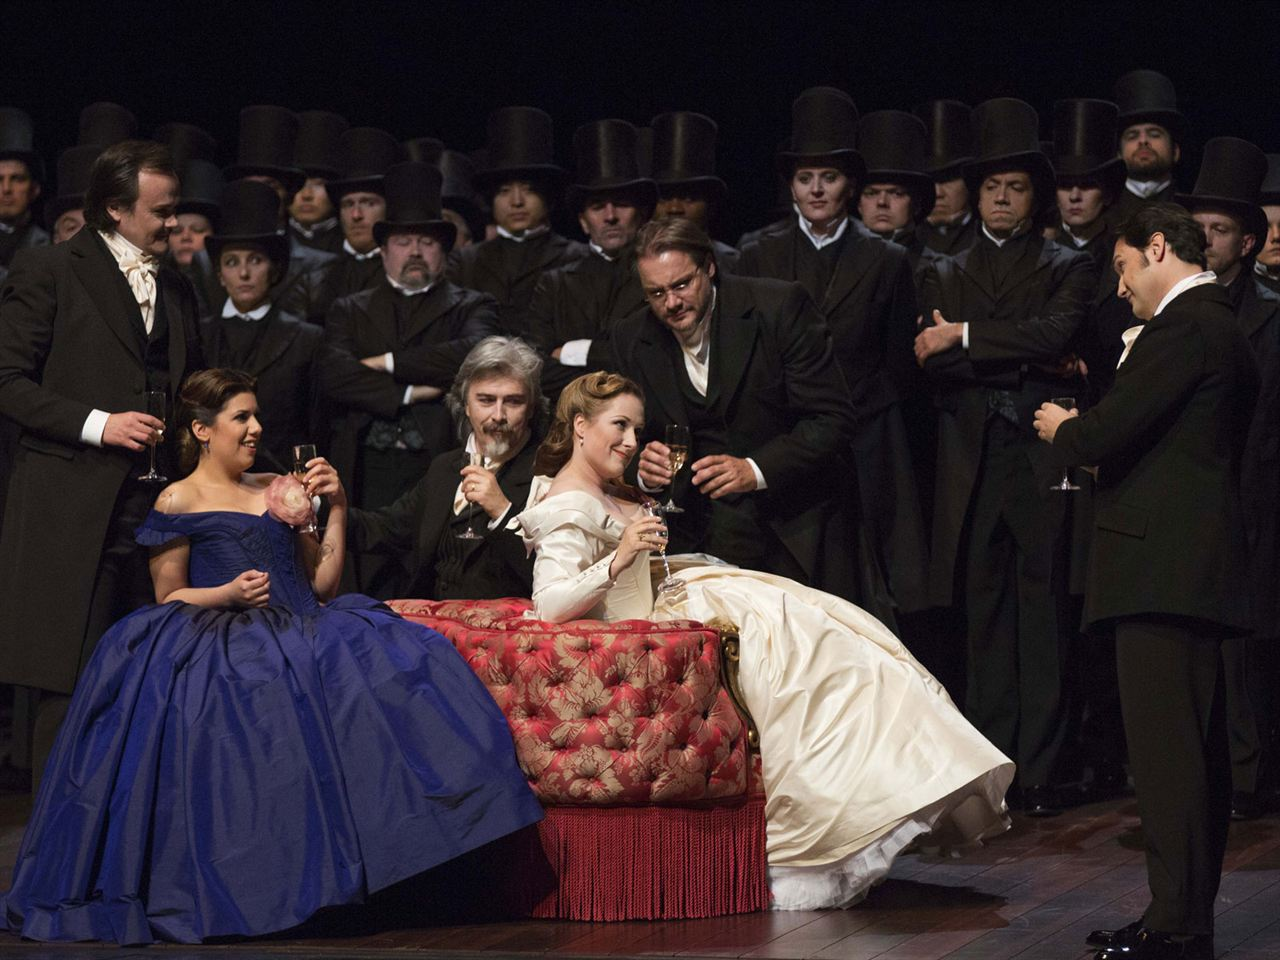 La traviata 2014 au cin ma limoges centre ville grand ecran - Cinema grand ecran limoges ...